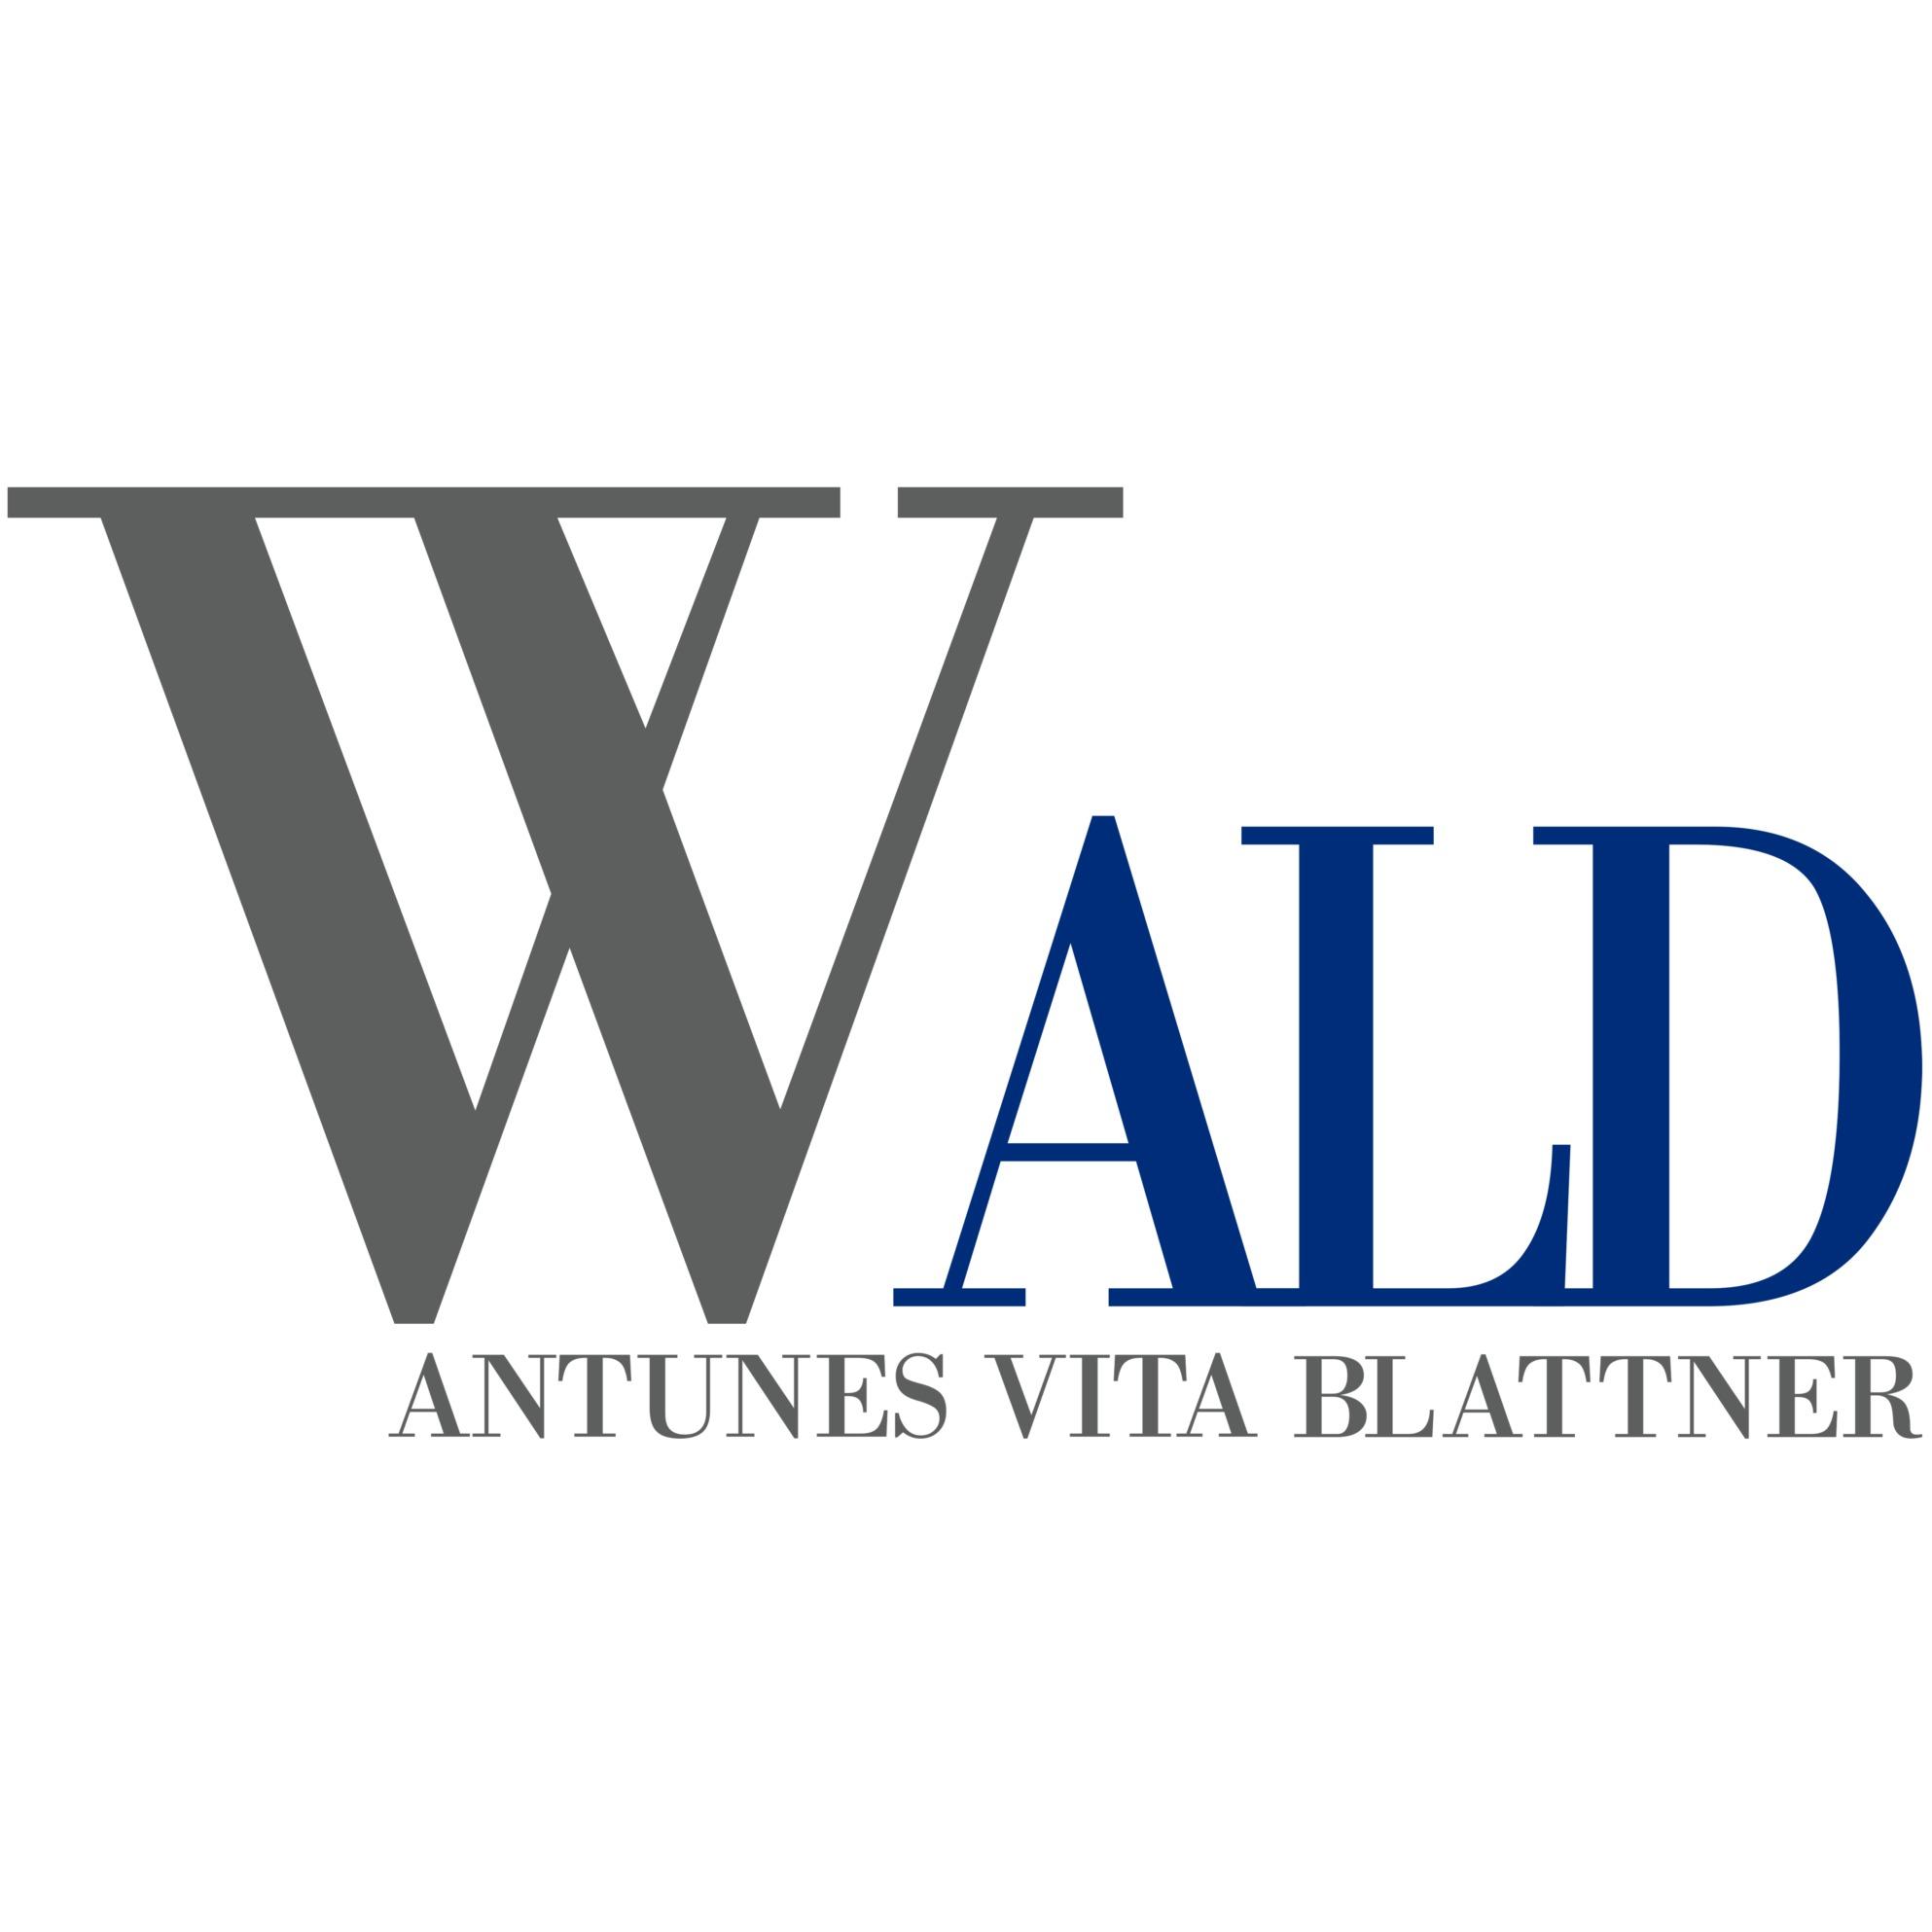 the Wald, Antunes, Vita e Blattner Advogados logo.